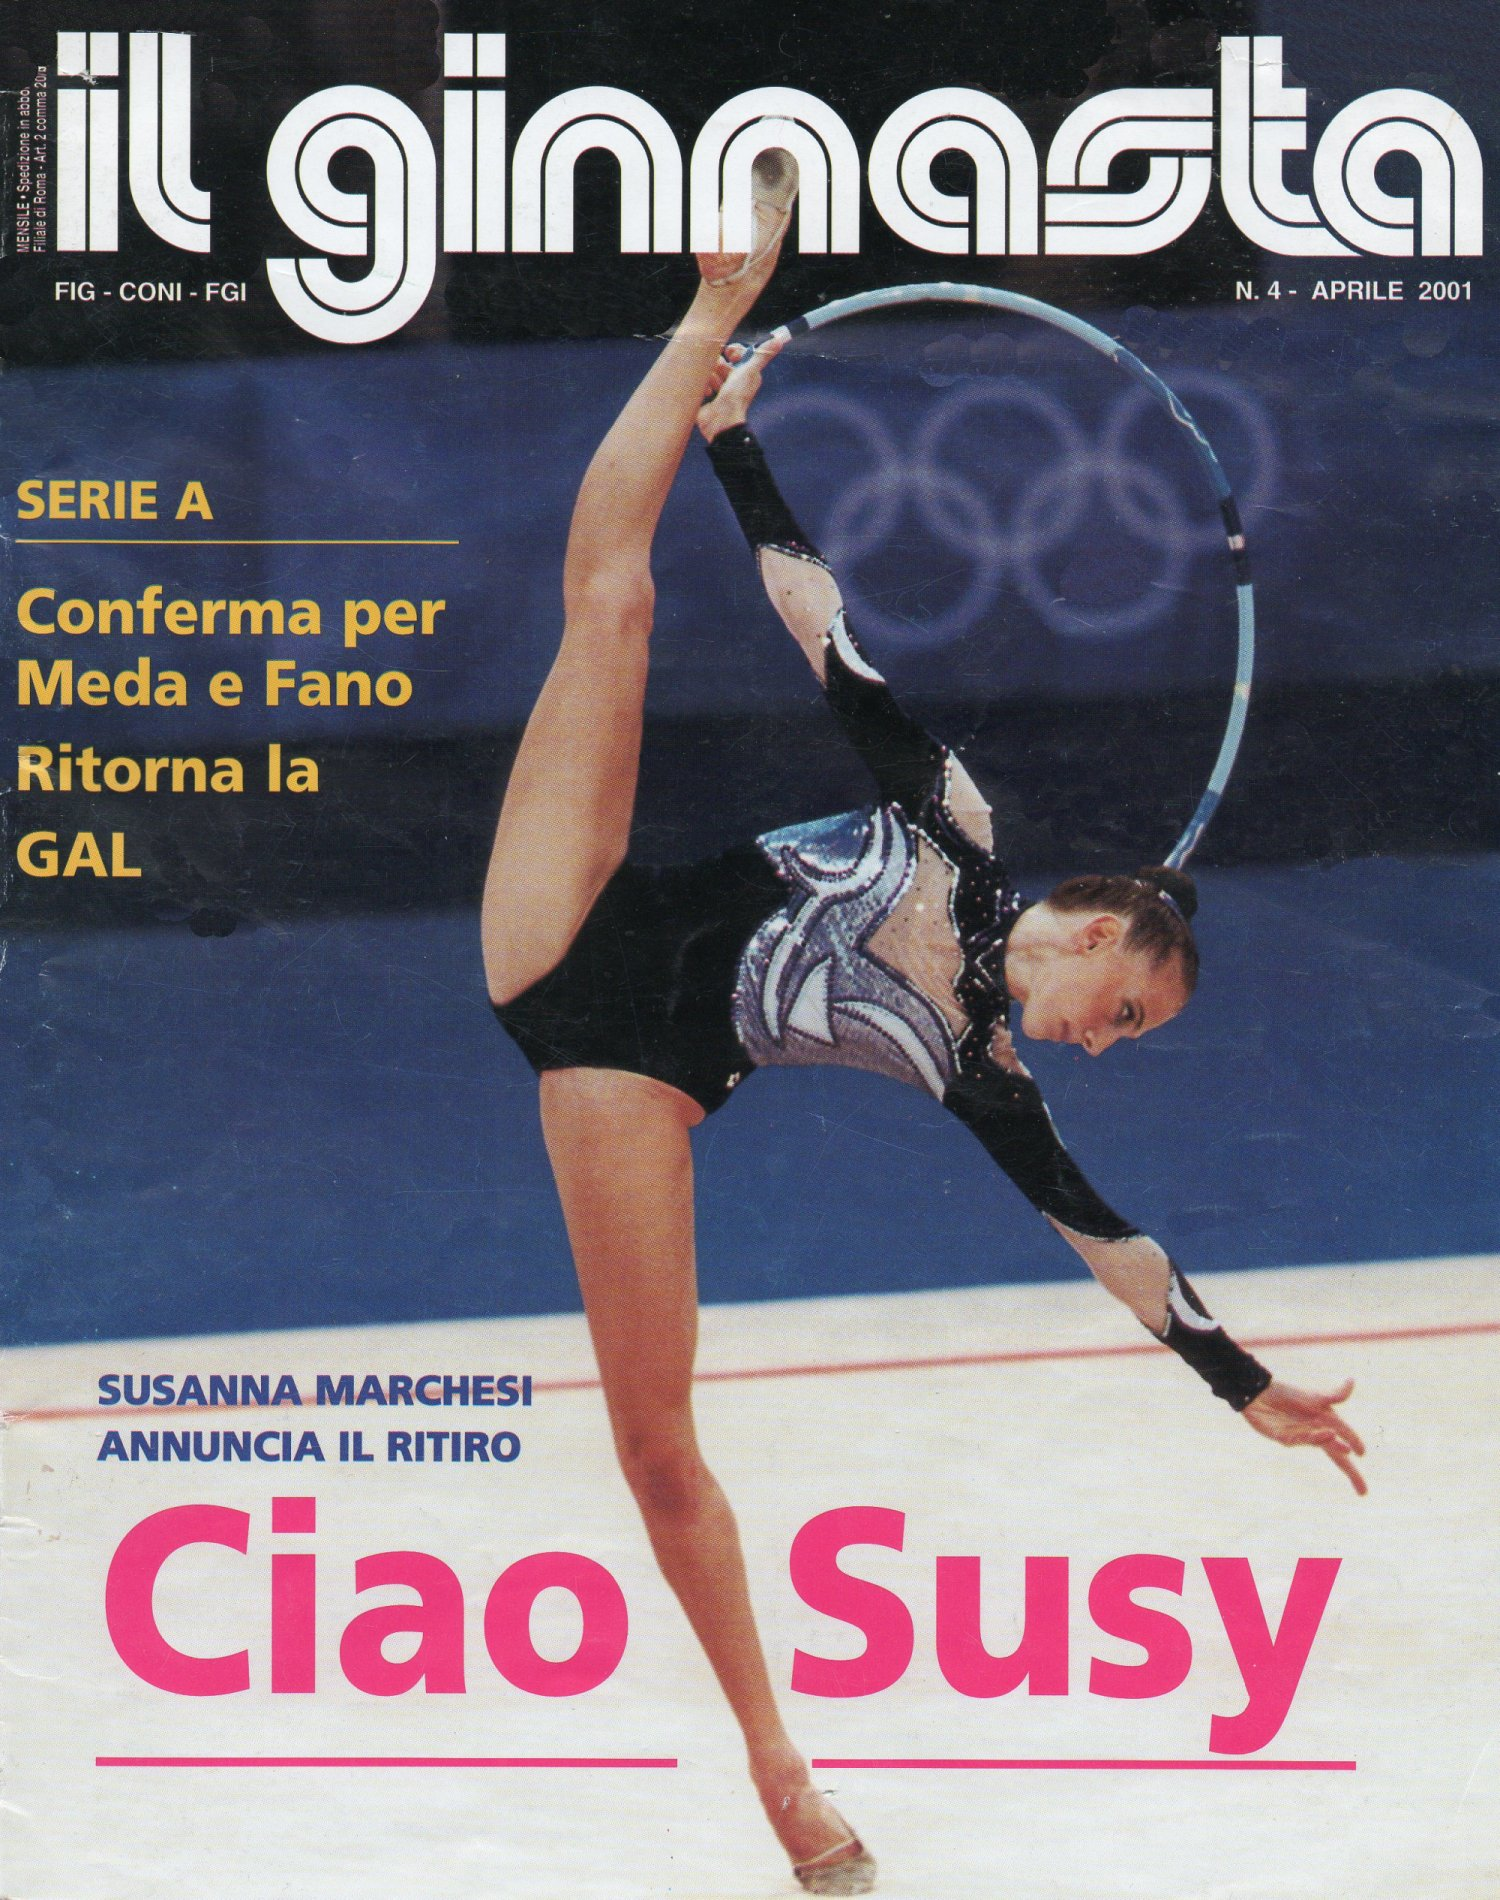 Susanna Marchesi